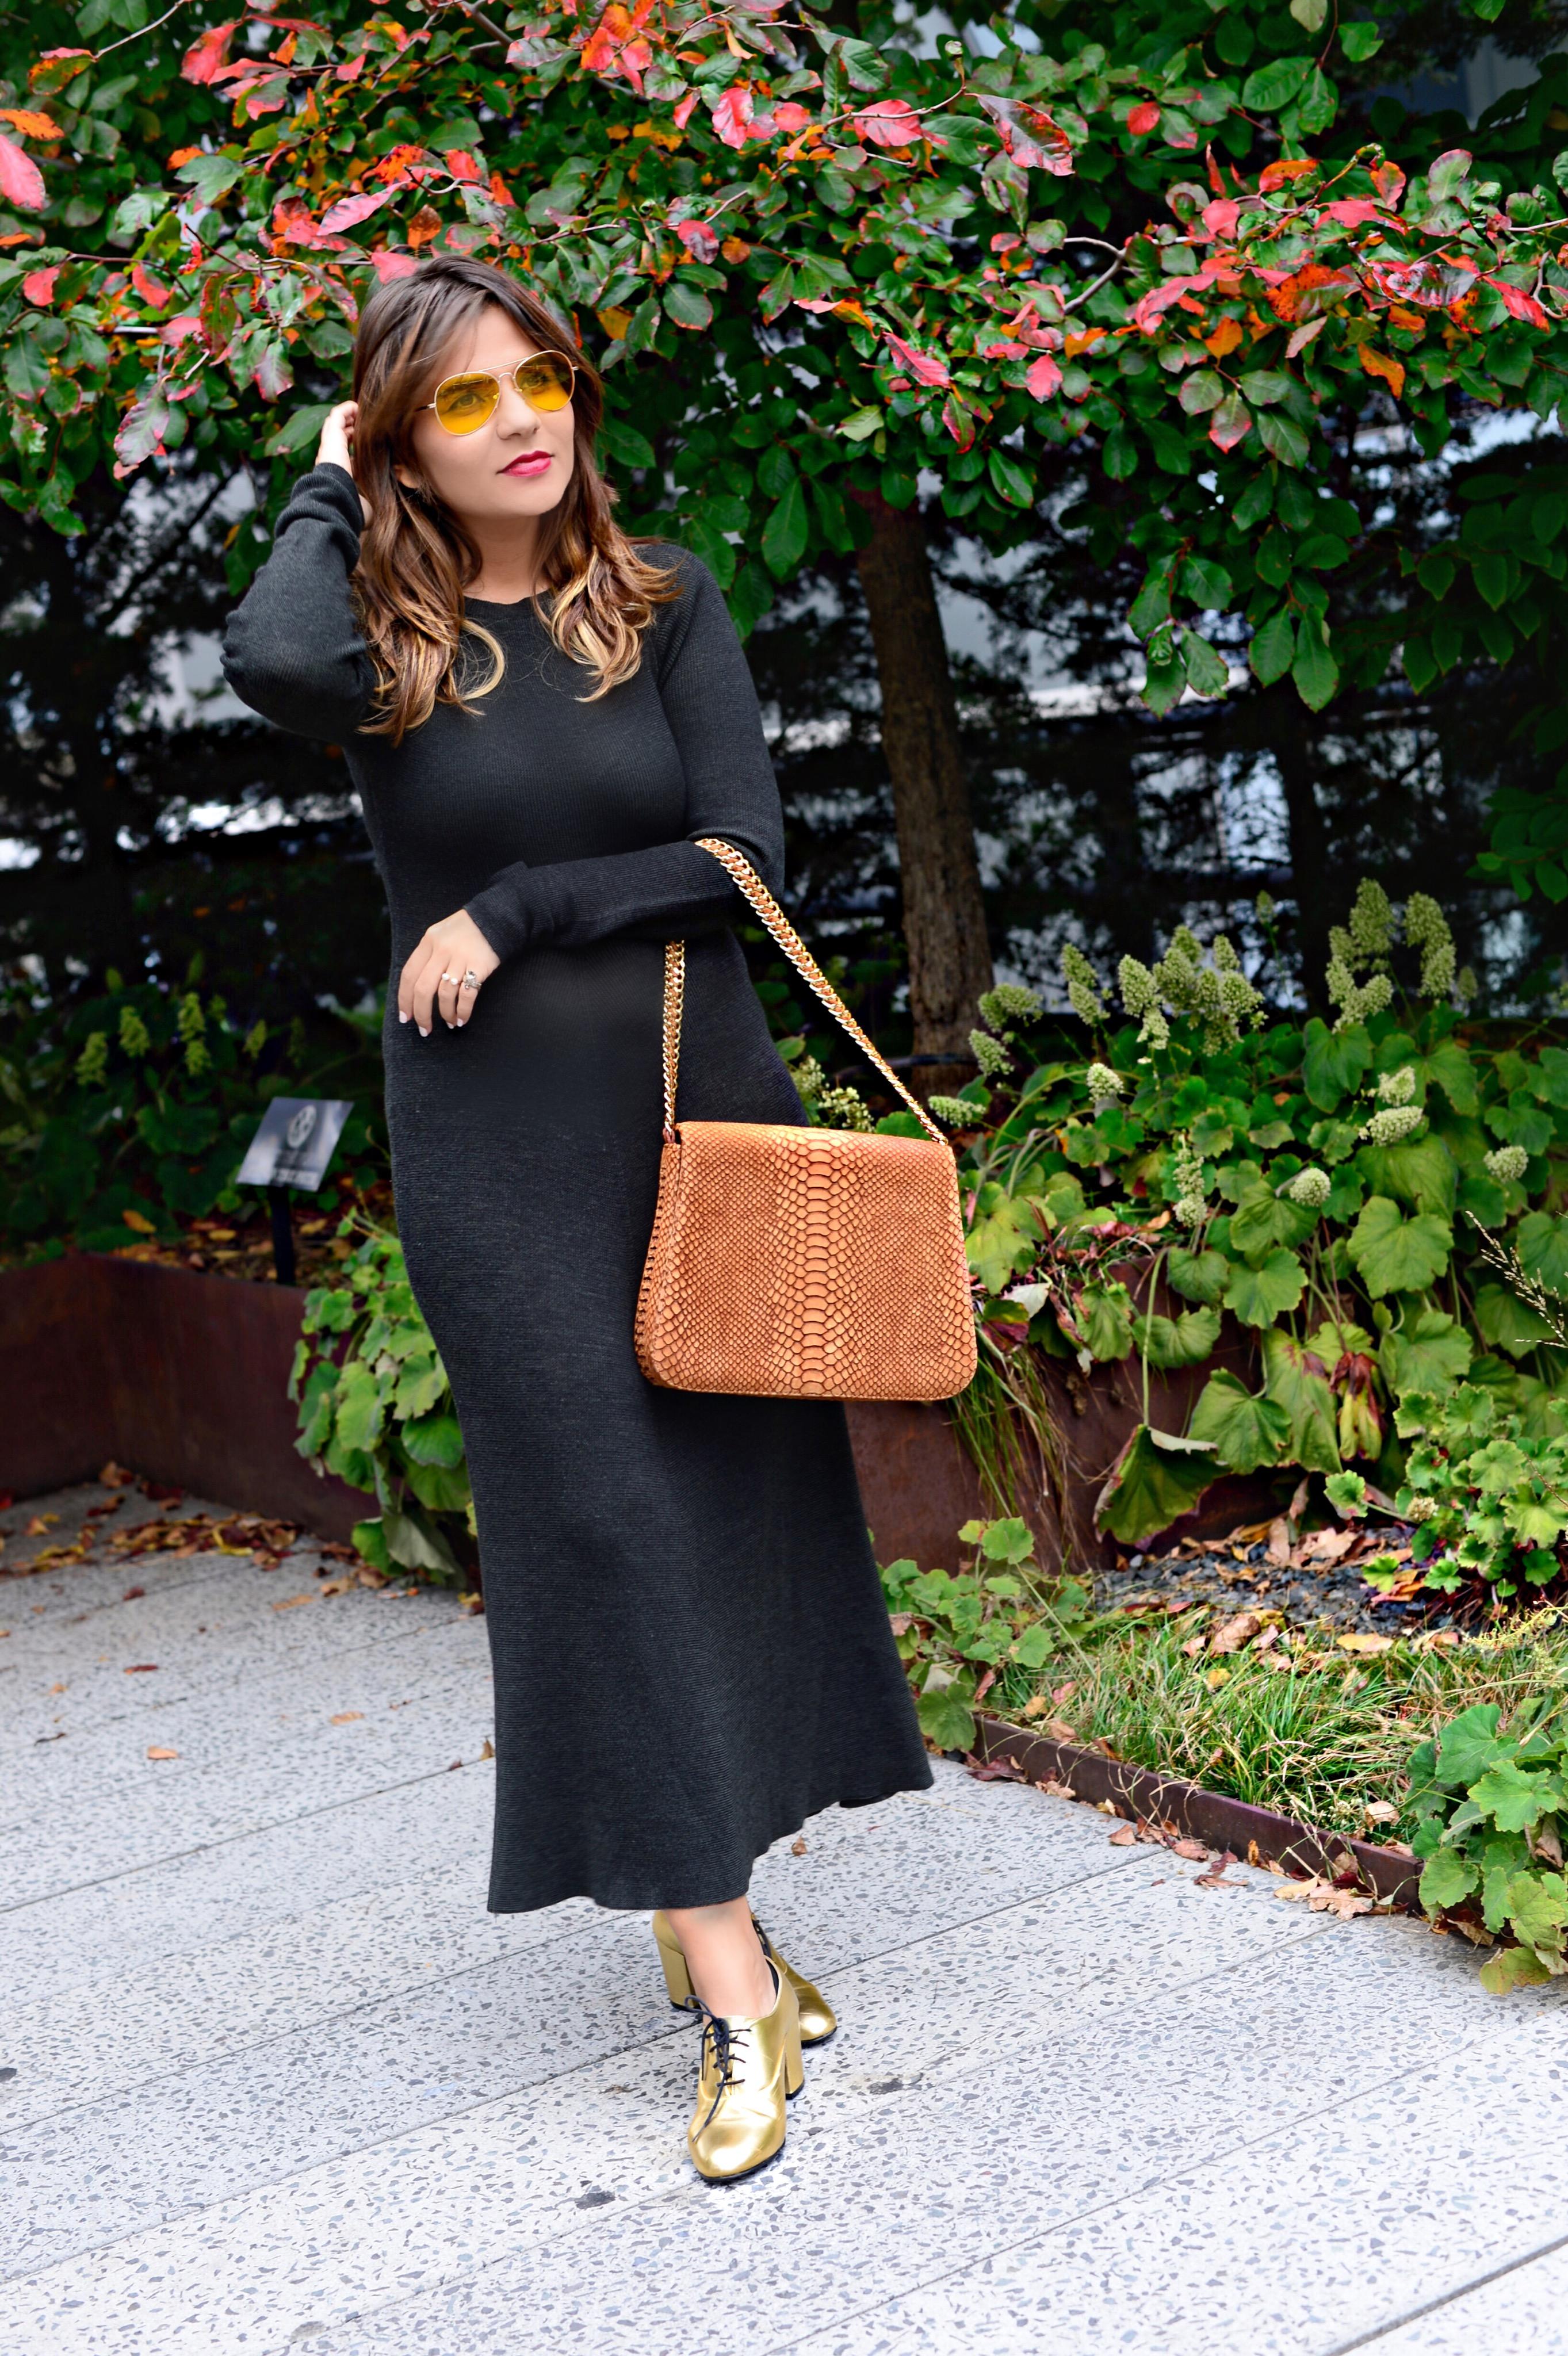 jersey-dress-gold-shoes-alley-girl-betul-yildiz-new-york-fashion-blogger